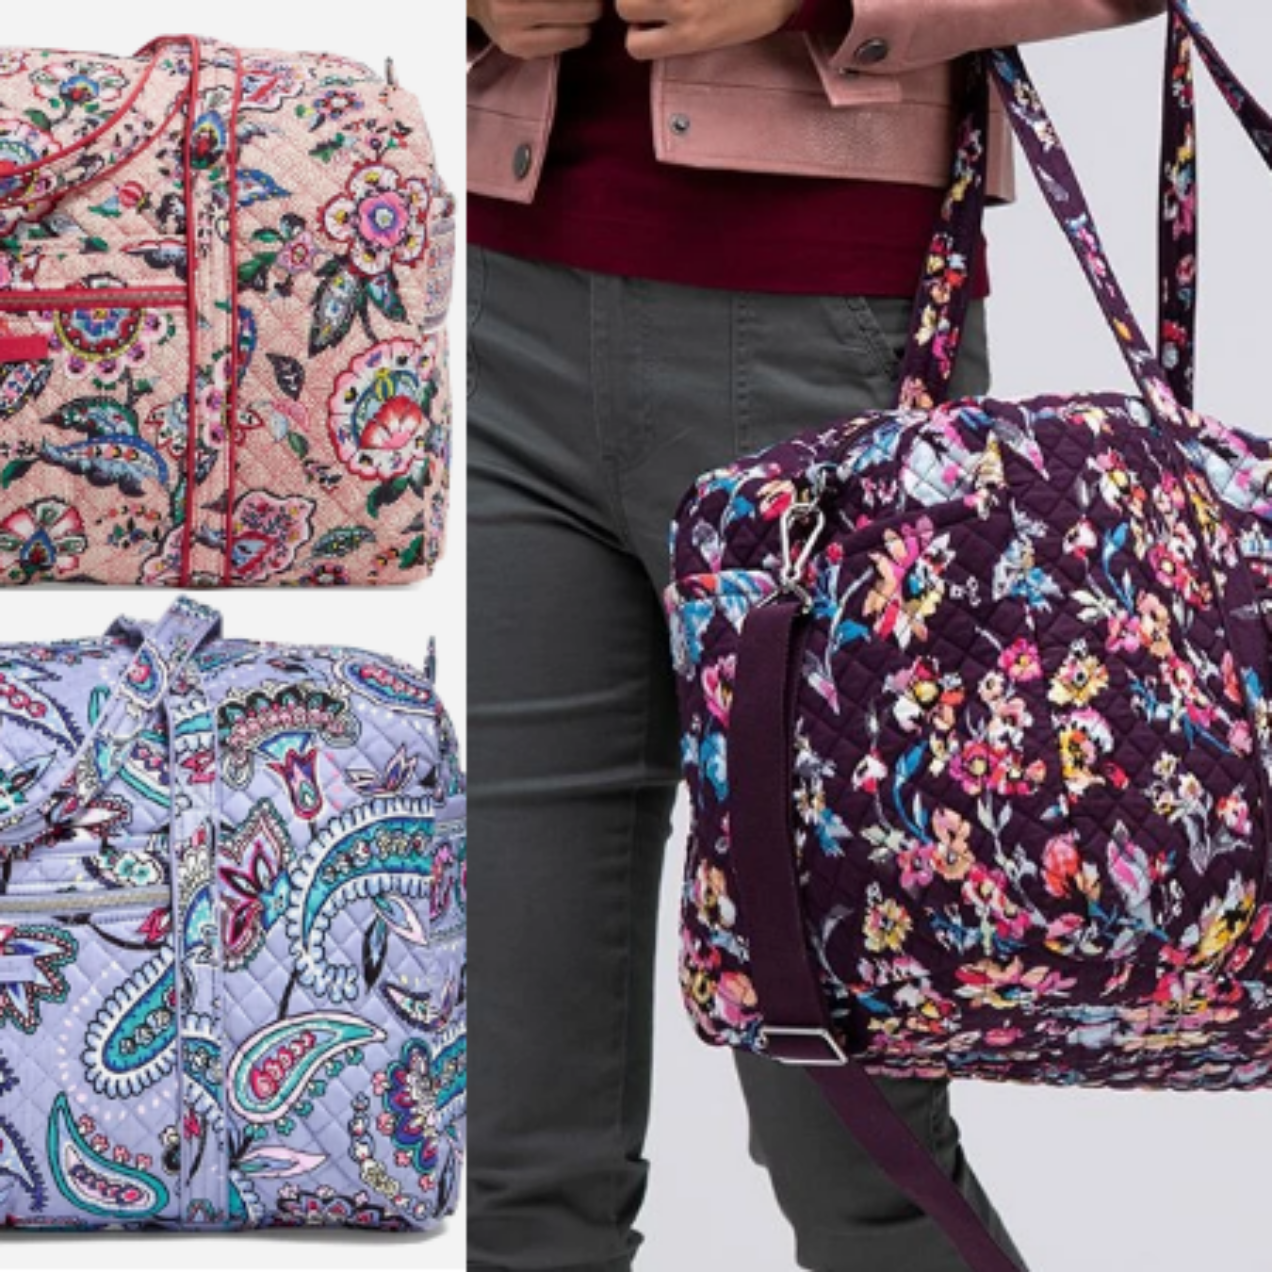 Vera Bradley Large Duffel Bag Only $35 Shipped (Regular $100)!